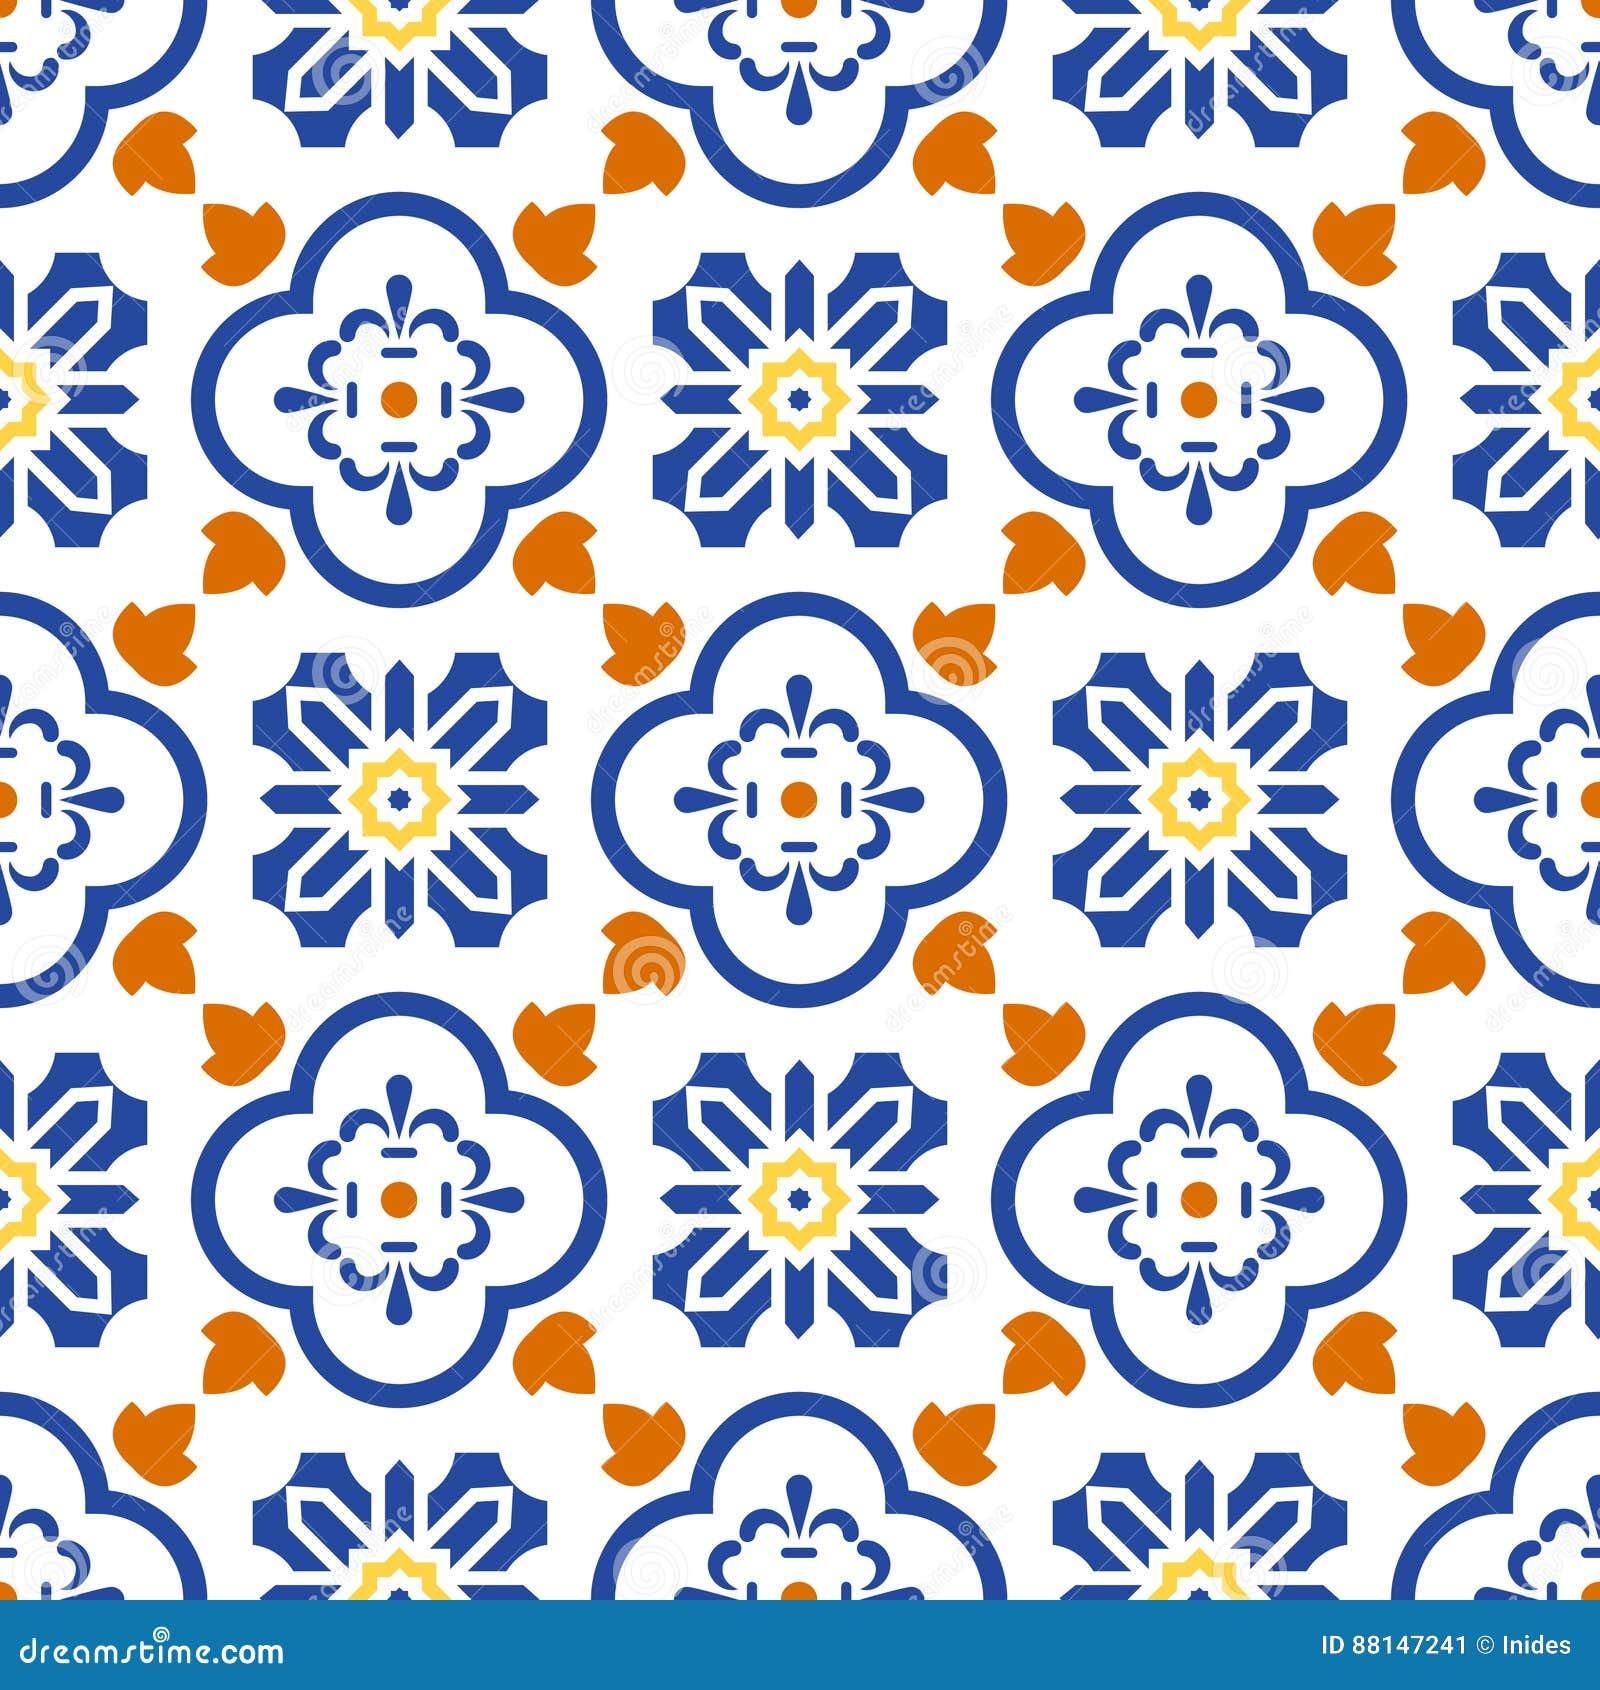 Ceramic Blue And White Mediterranean Seamless Tile Pattern